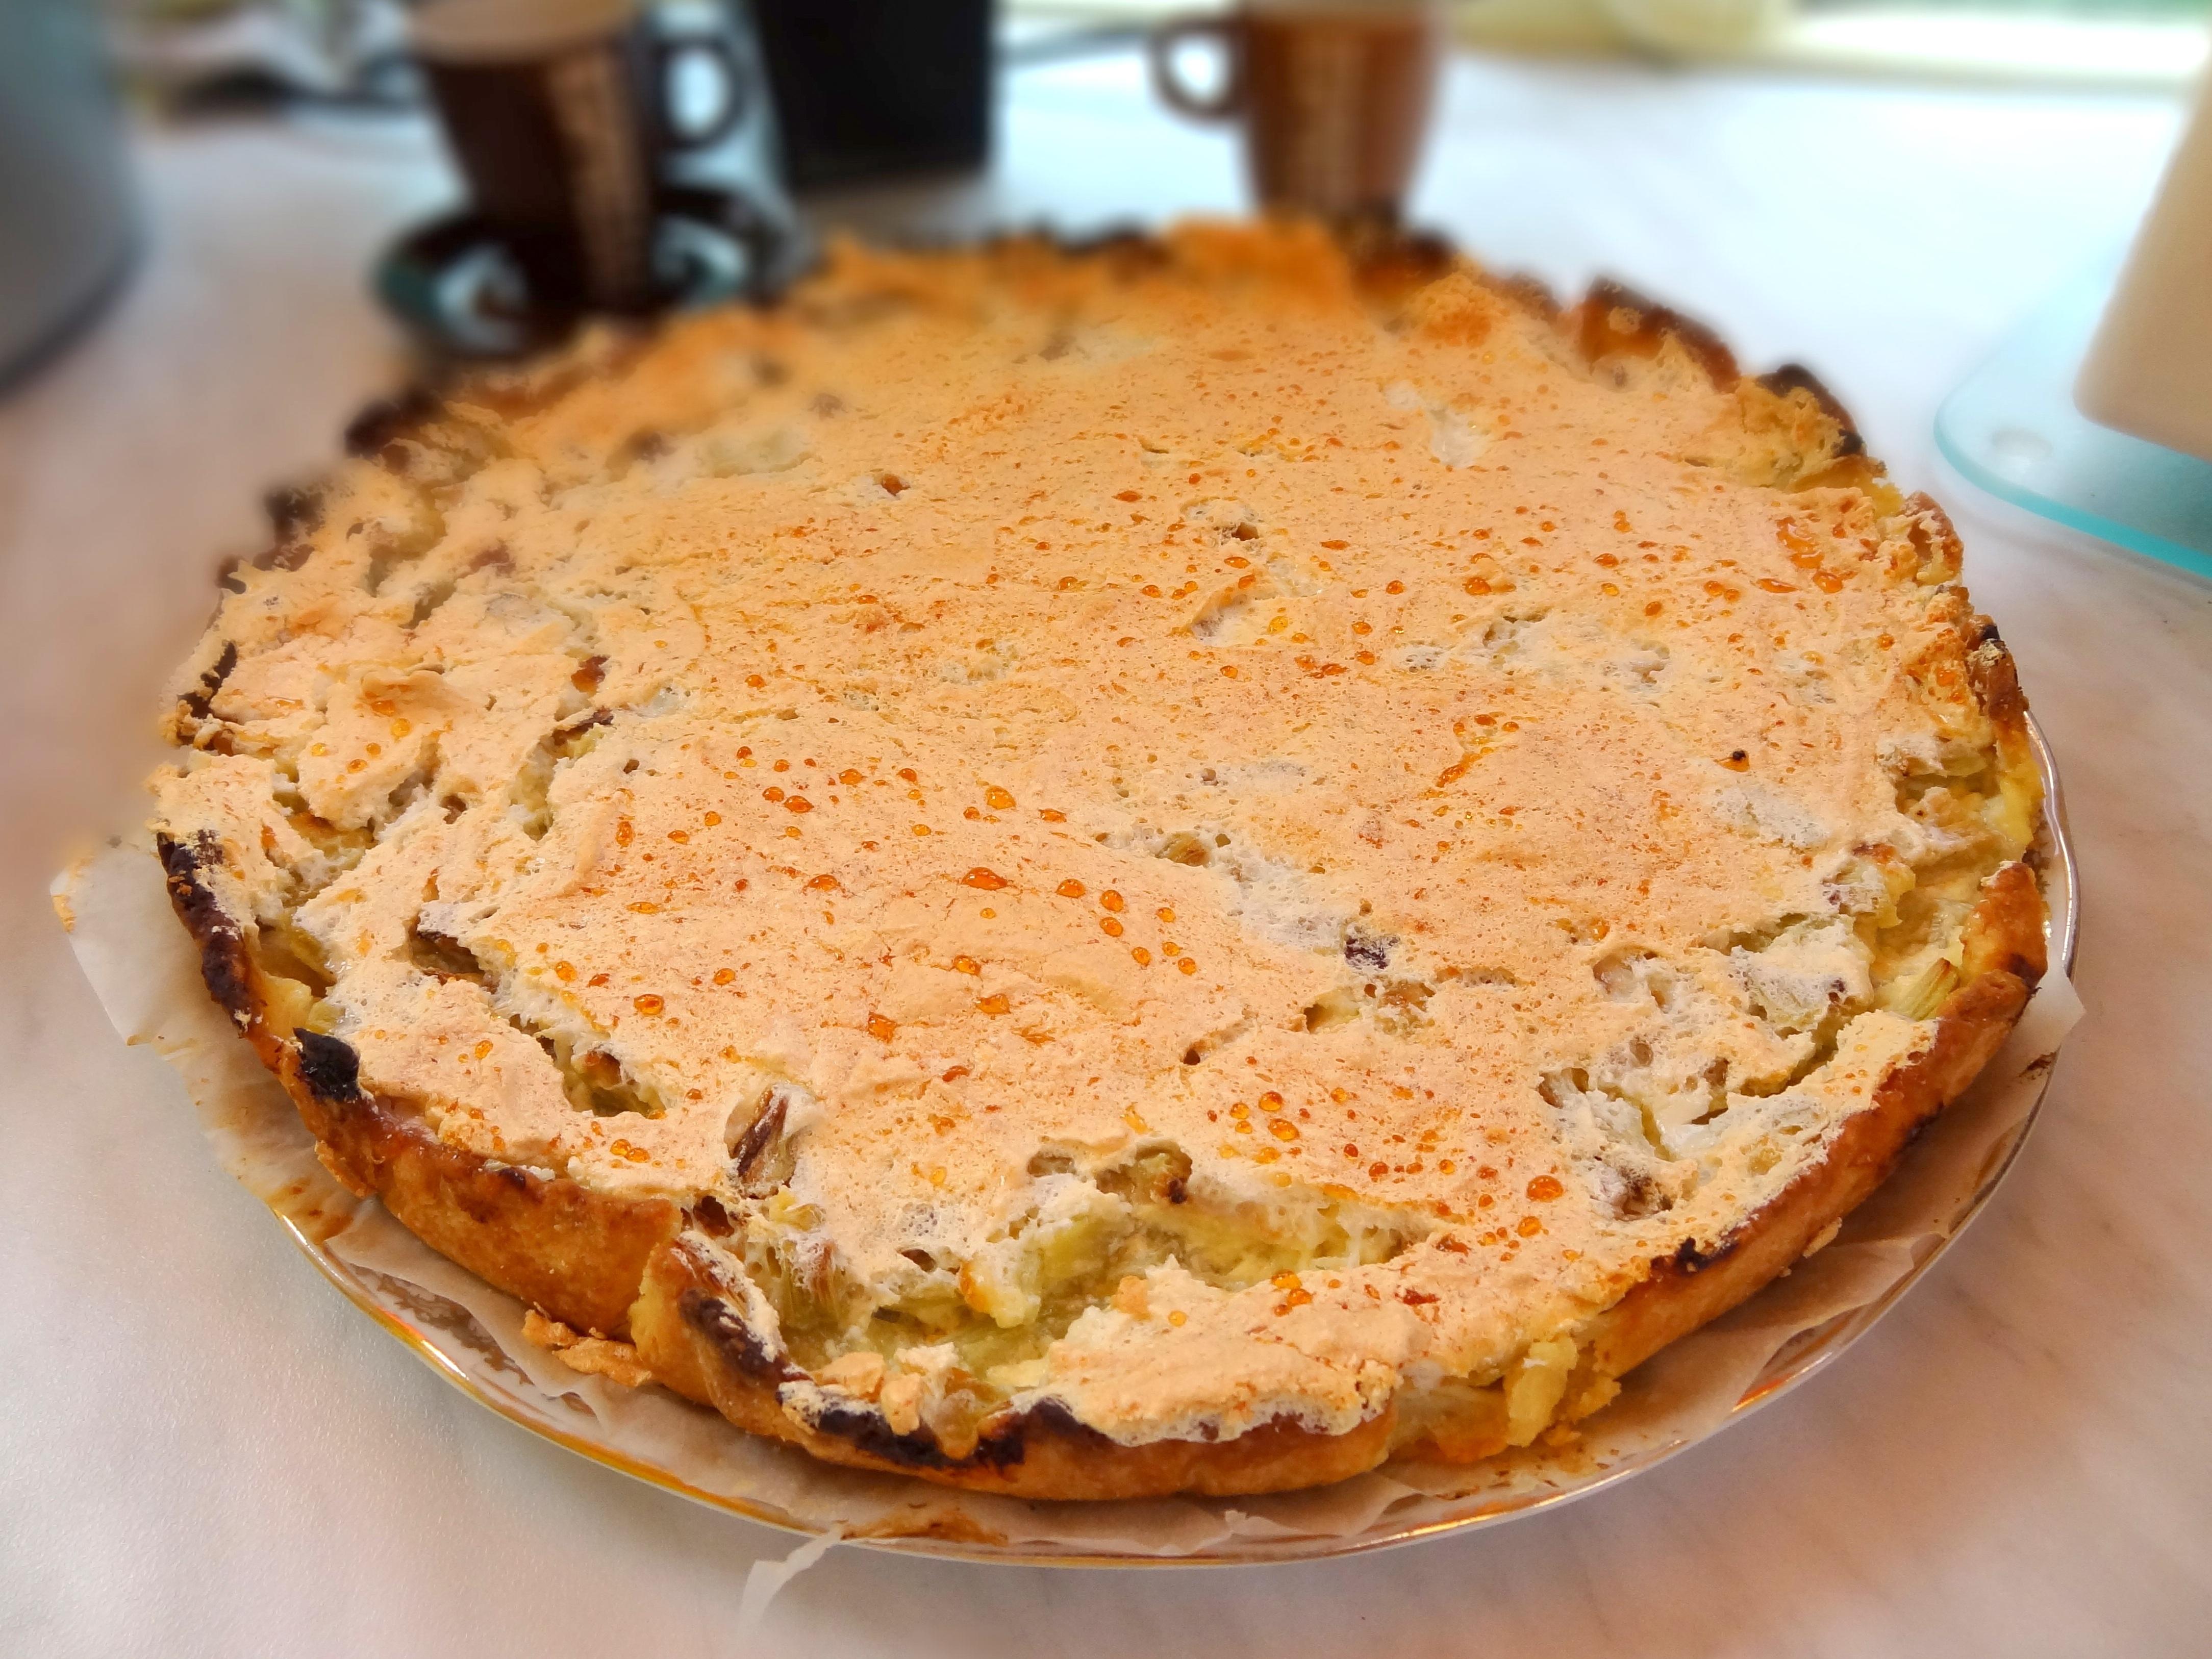 Tarte la rhubarbe meringu e recette facile - Cuisson meringue four chaleur tournante ...